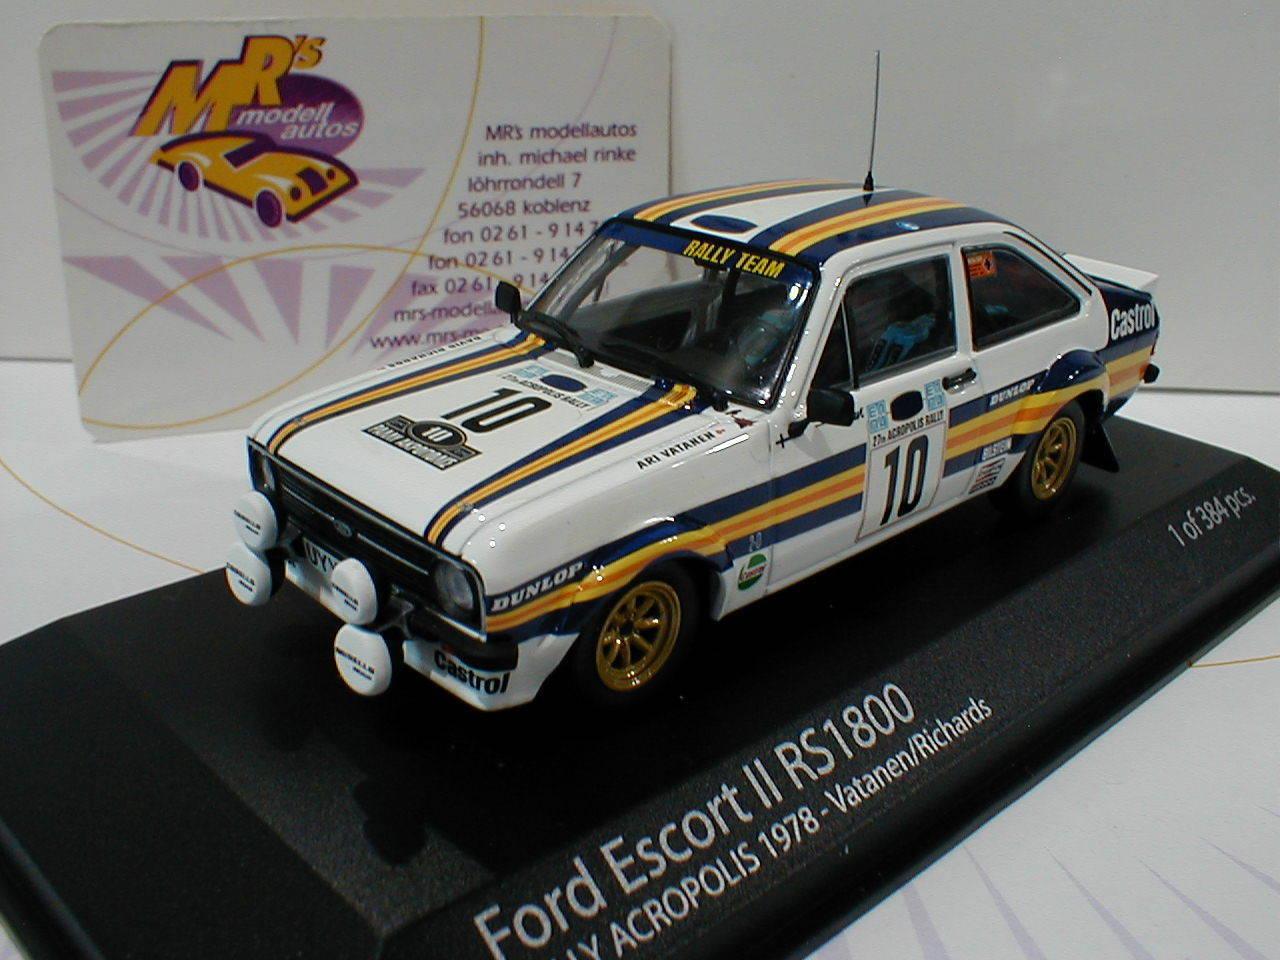 Minichamps 400808410   ford escort II rs1800    10 acropolisrally 1980 vatanen 1 43  ganancia cero